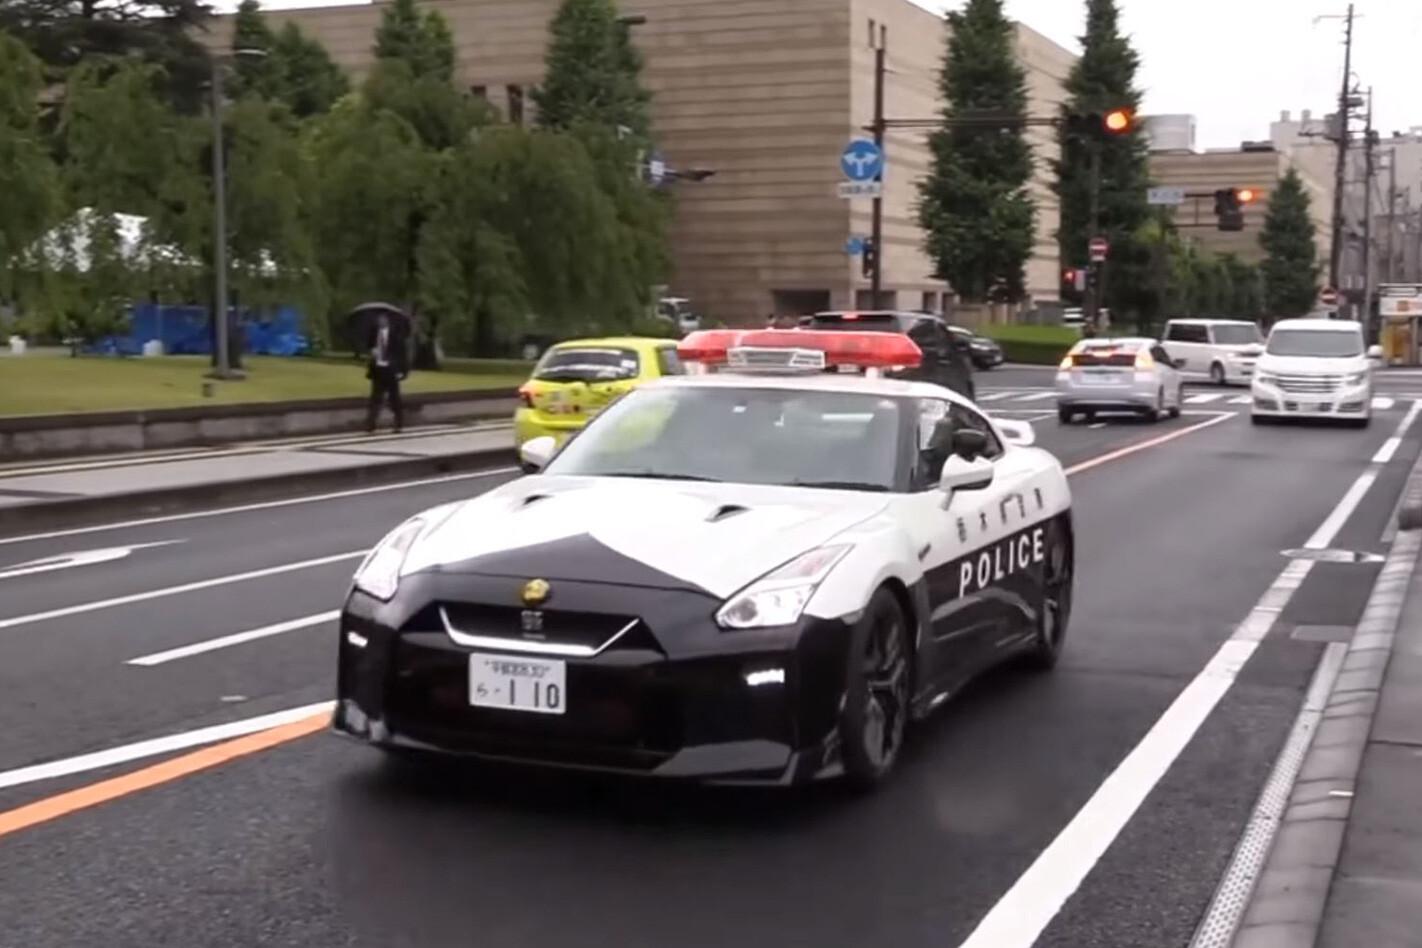 https://d3lp4xedbqa8a5.cloudfront.net/s3/digital-cougar-assets/whichcar-media/16562/nissan-gt-r-japanese-patrol-fleet-on-road.jpg